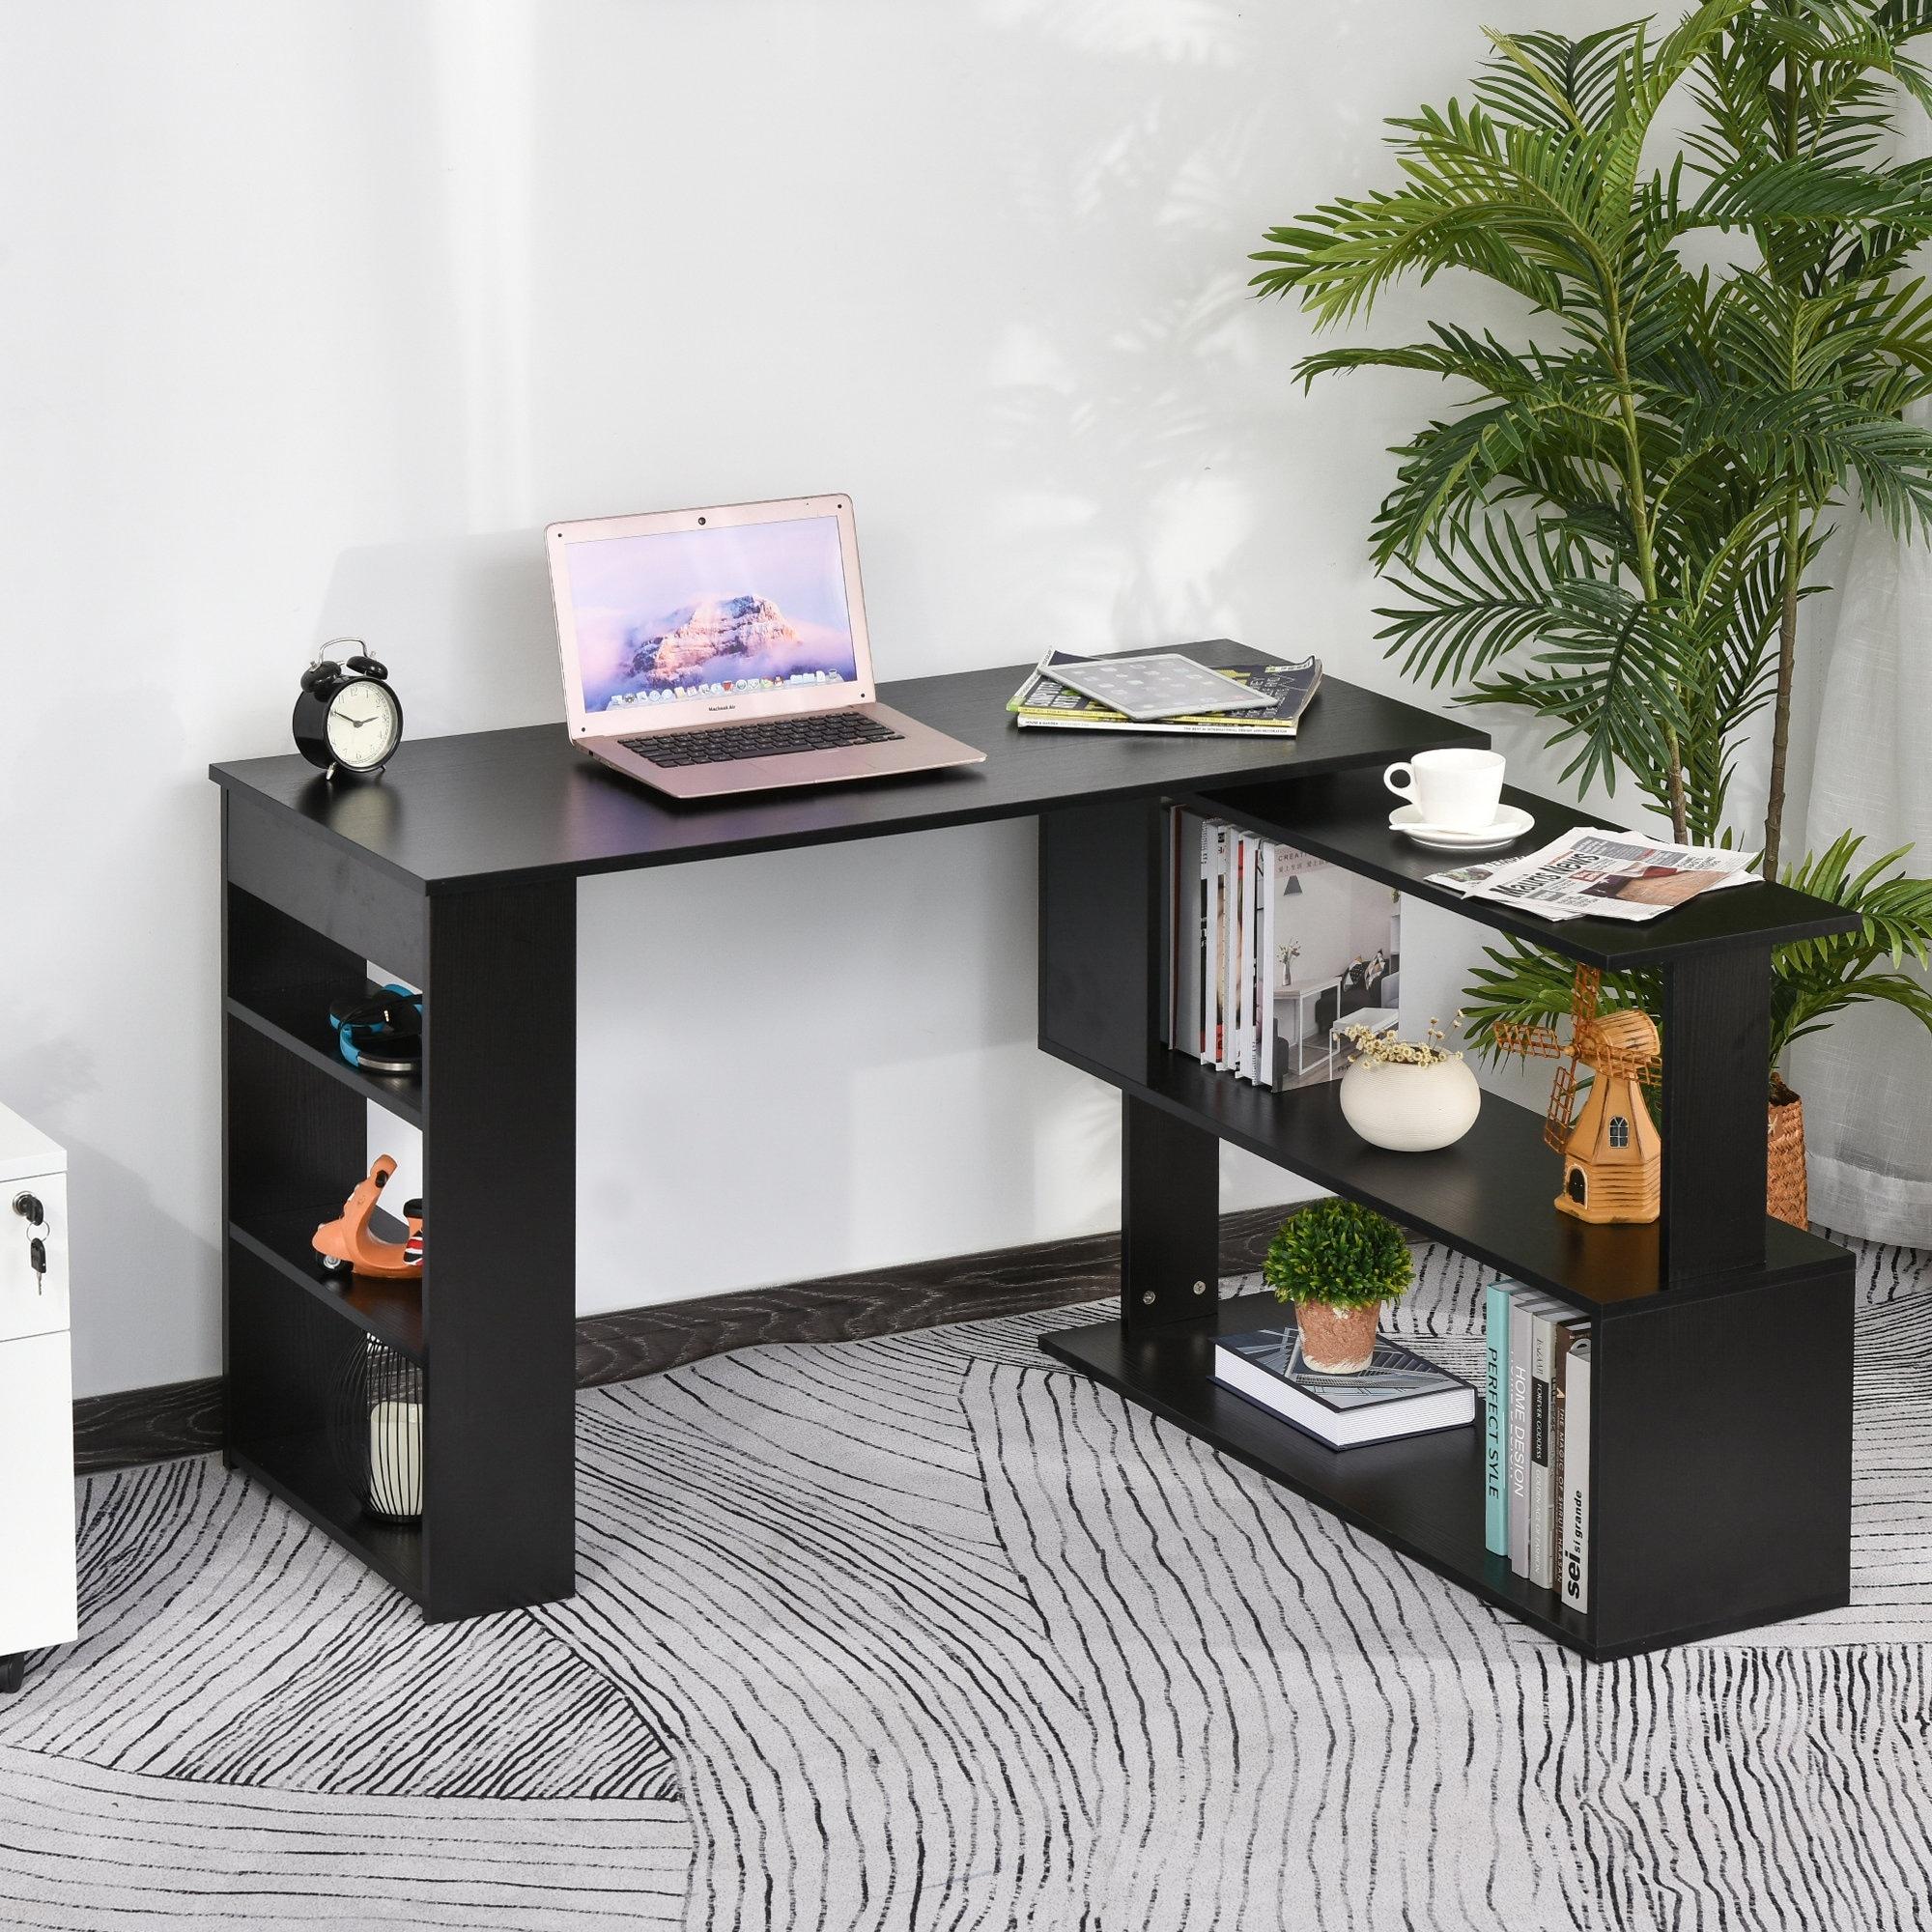 Porch %26 Den Arbordale Black Finish L shaped Rotating Computer Desk with Bookshelves